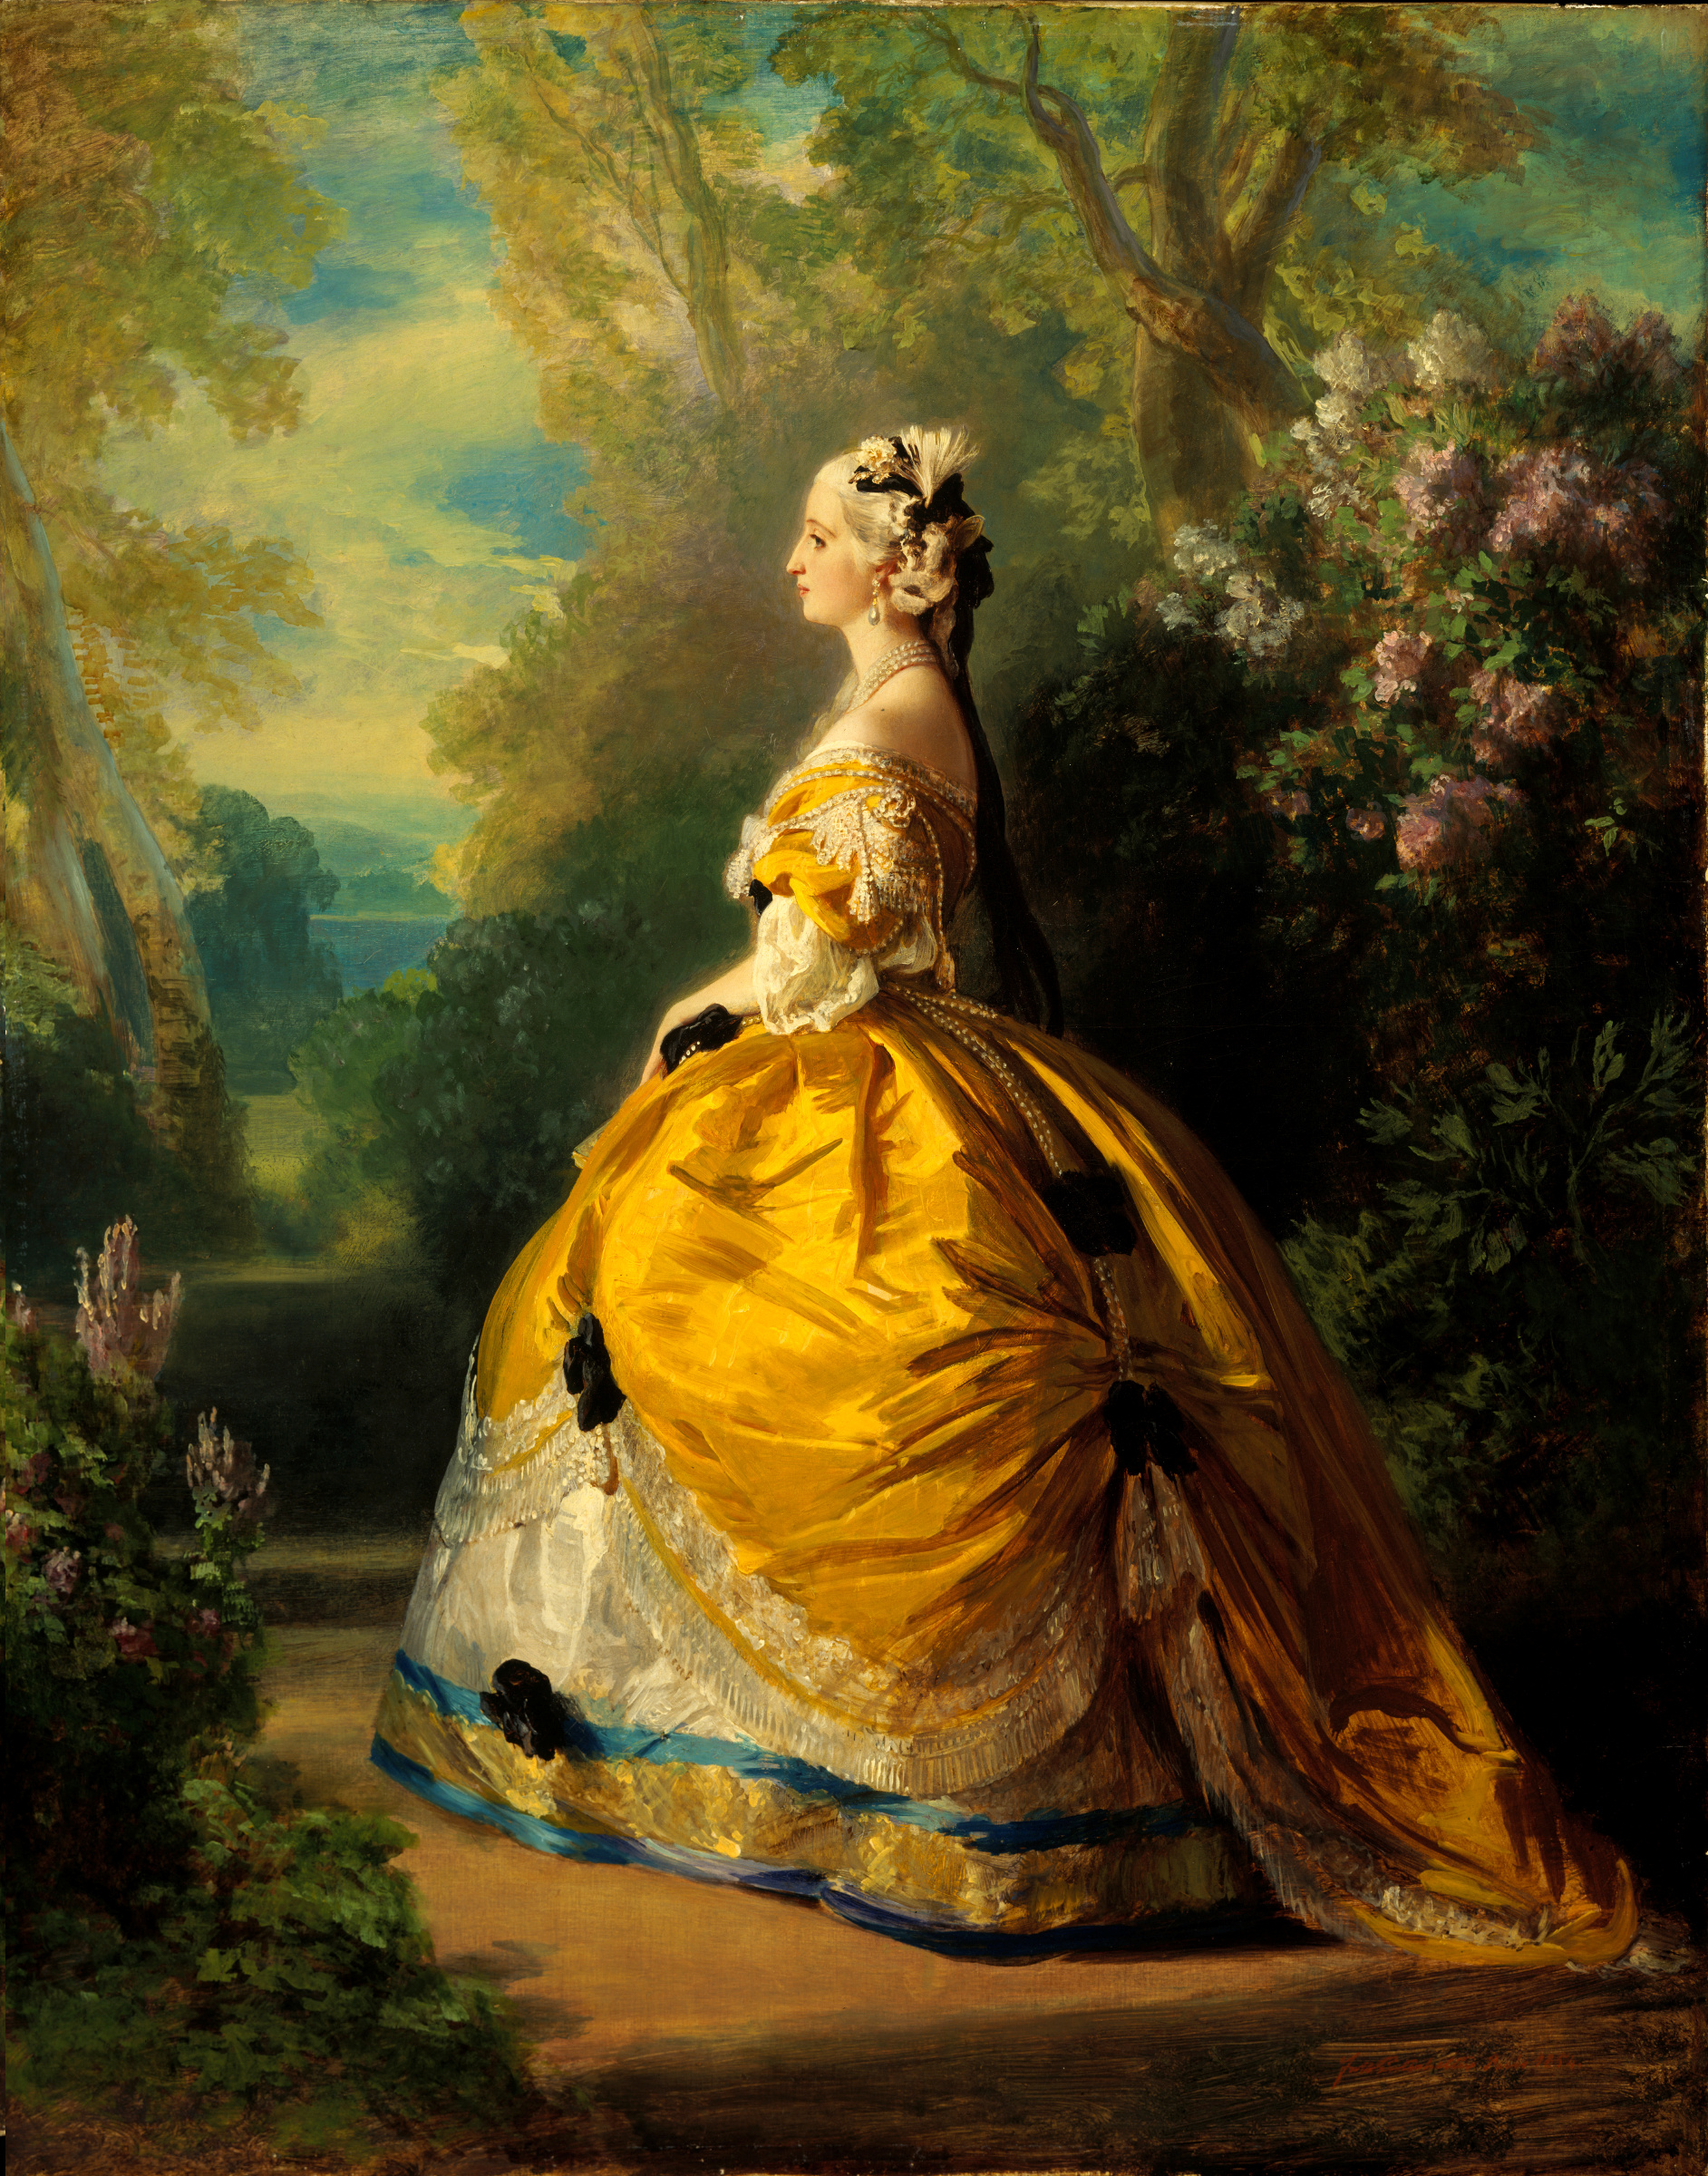 Franz X. Winterhalter, Empress Eugénie (Eugénie de Montijo, Condesa de Teba) in 18th-Century Costume, 1854, oil on canvas, The Metropolitan Museum of Art, New York.